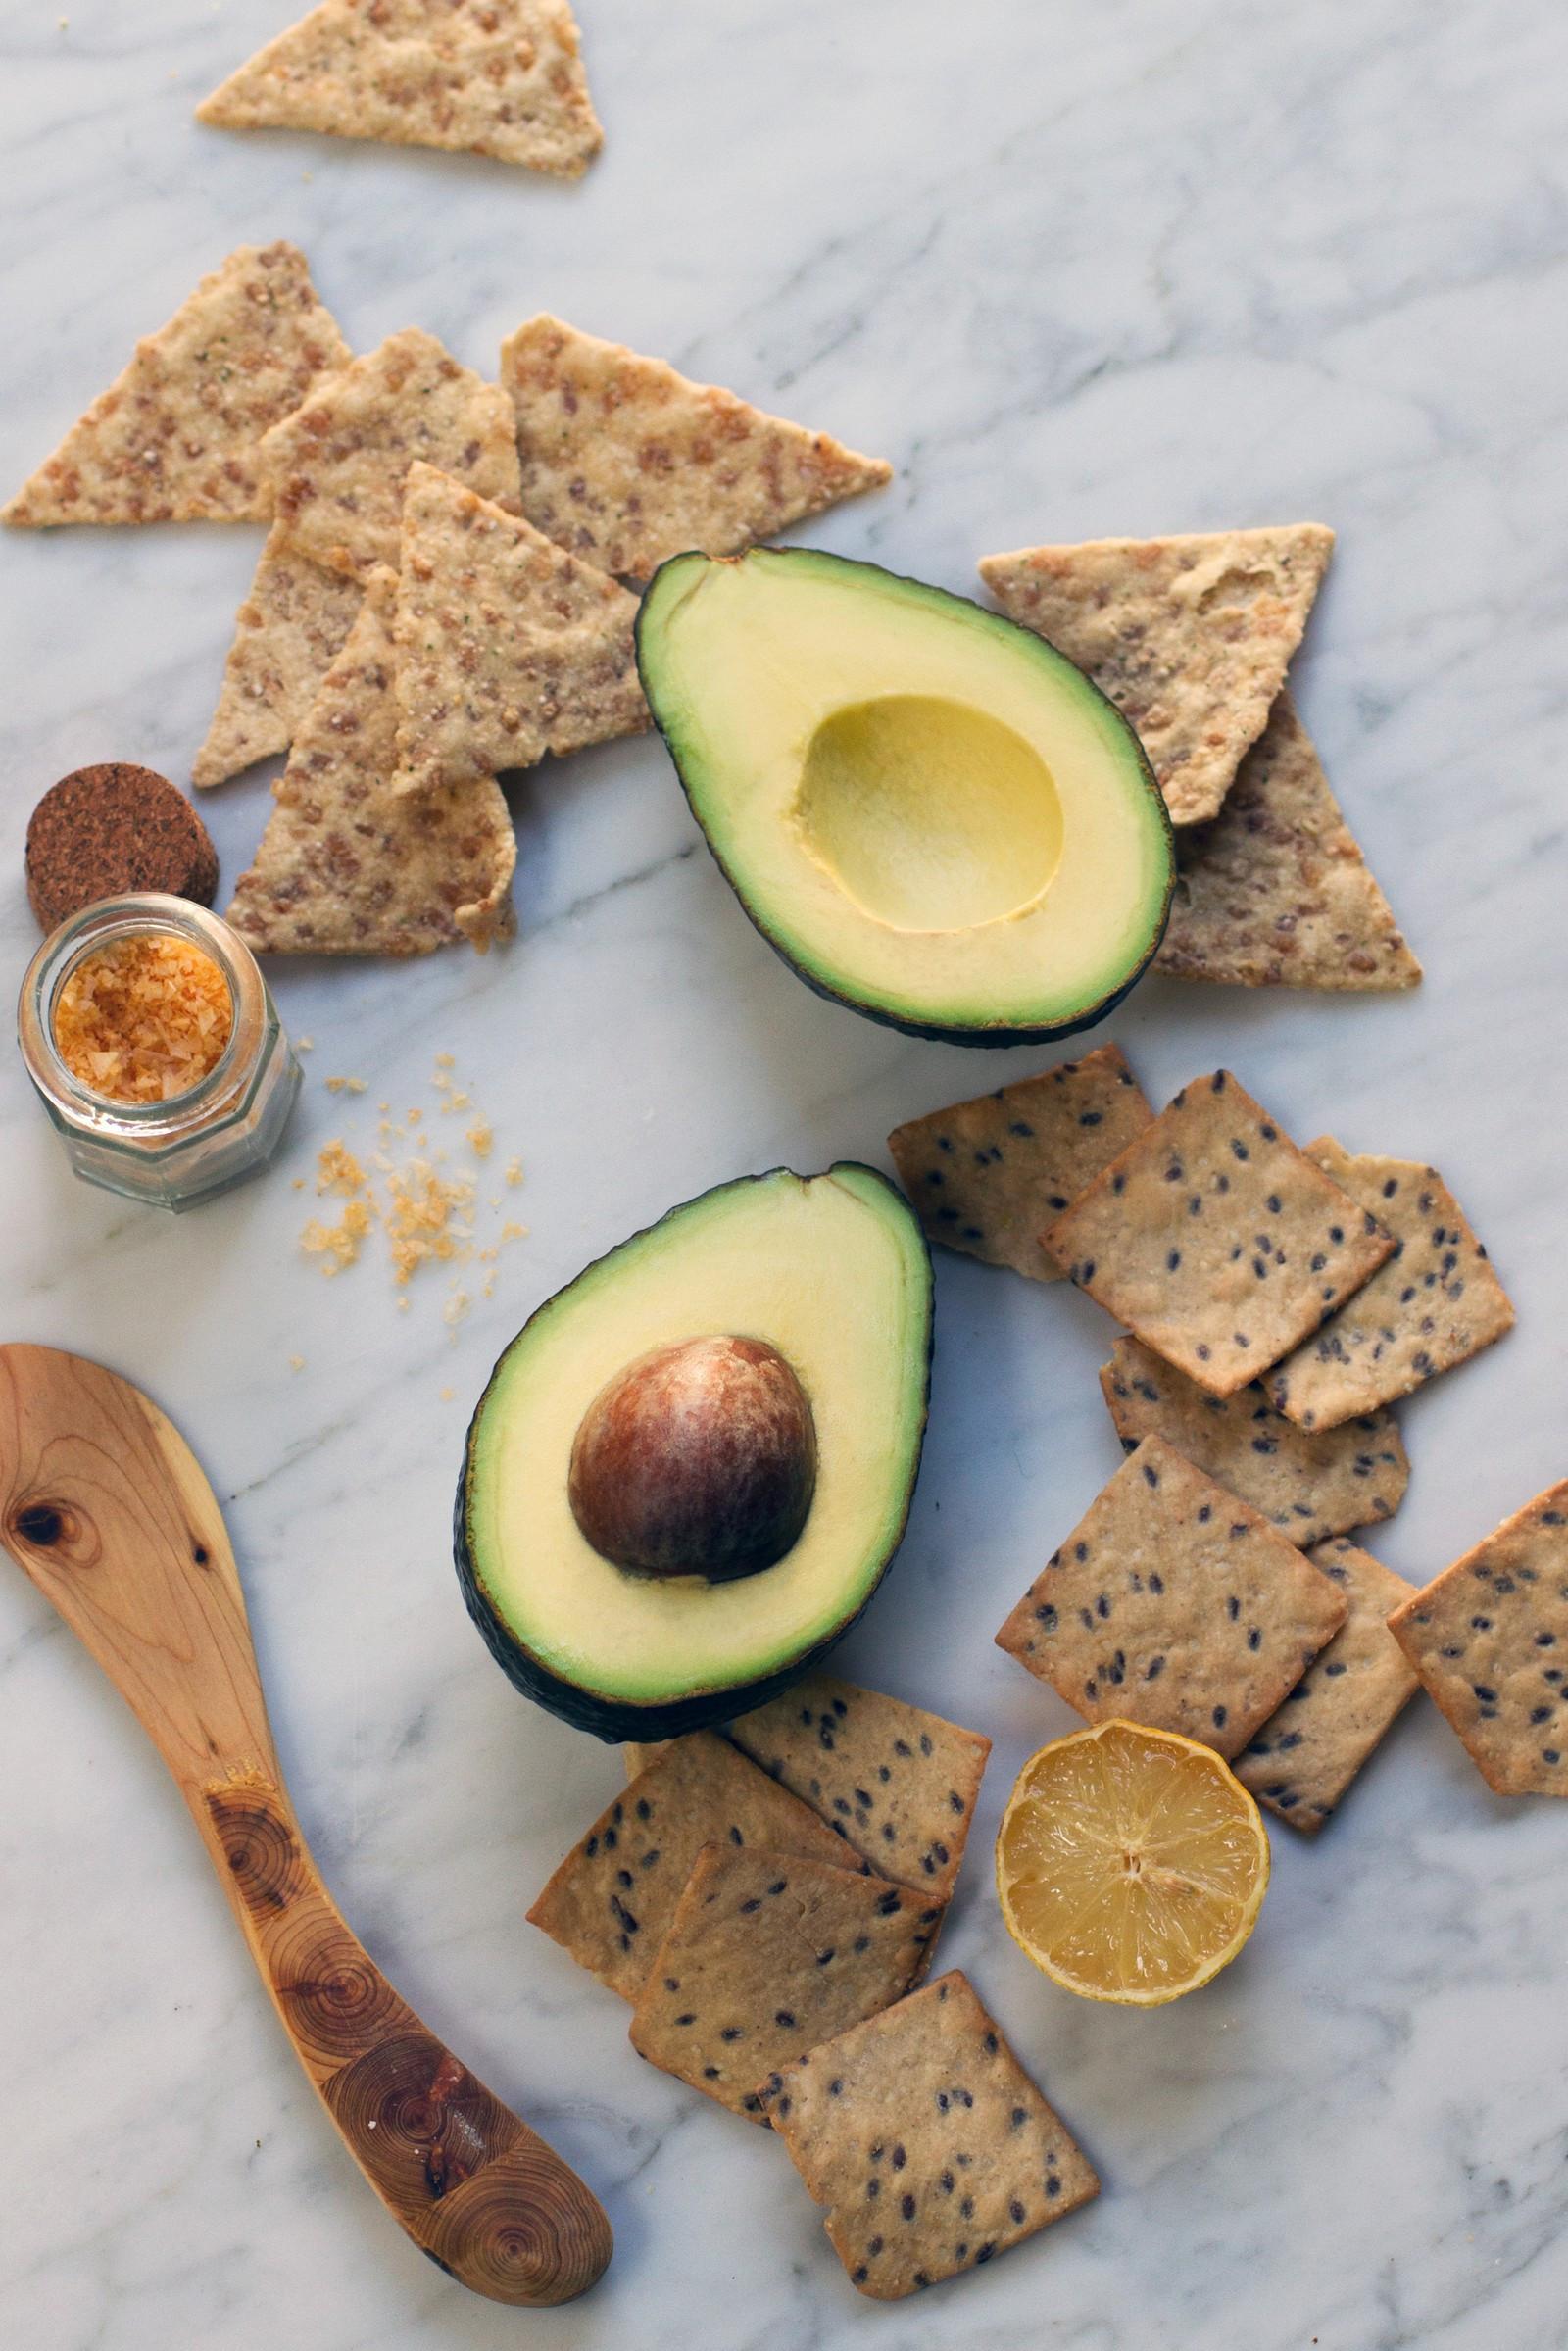 Healthy Avocado Snacks  Travel Snacks That Taste Better Than Airplane Food